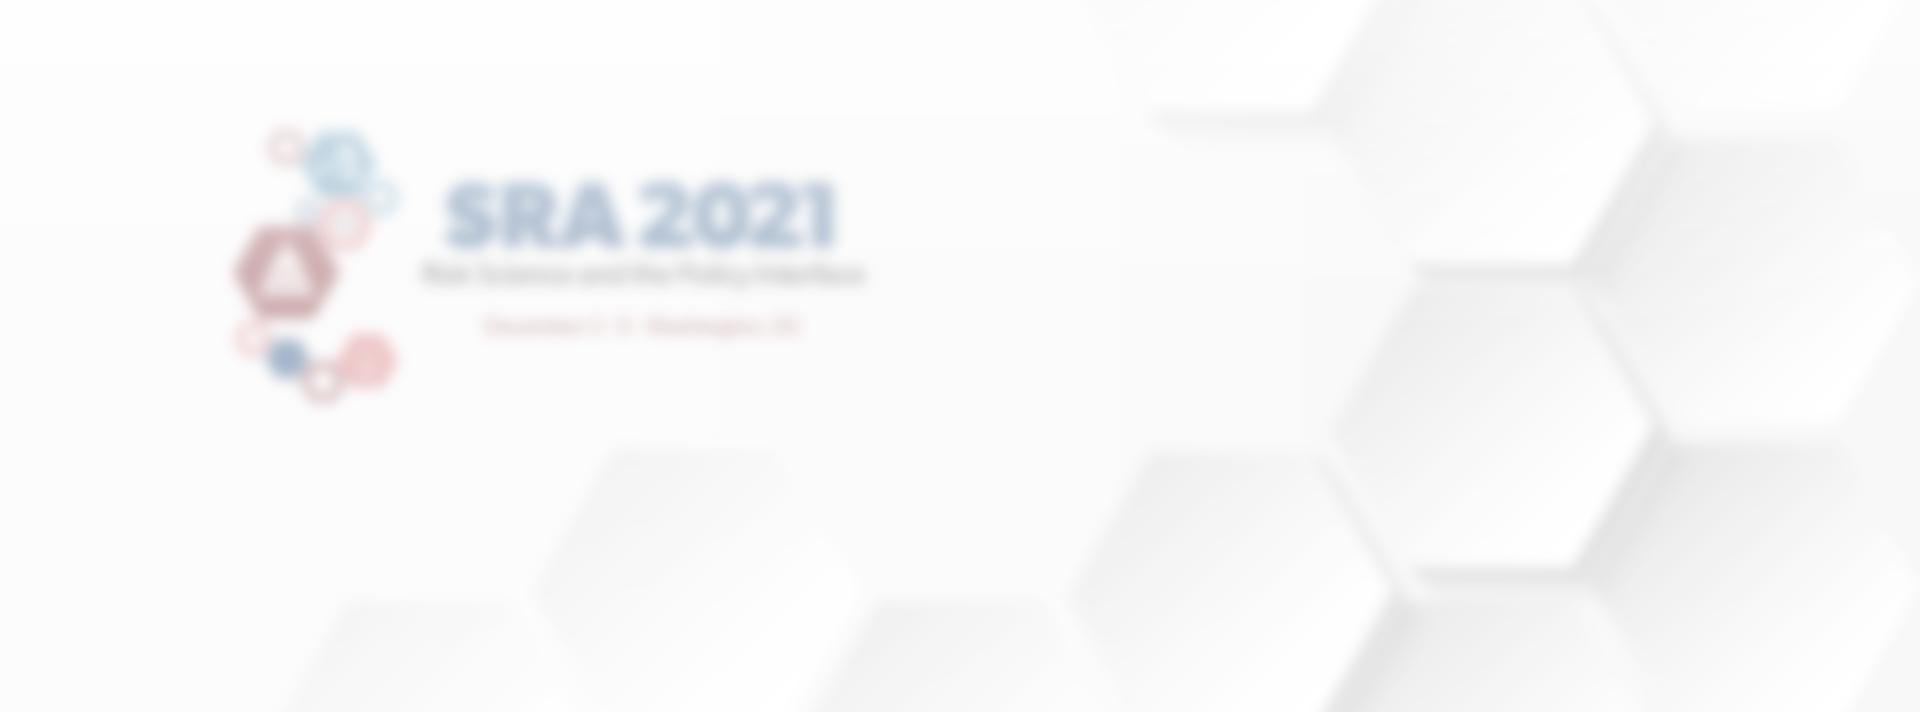 Sra000 2021annualmtg Background